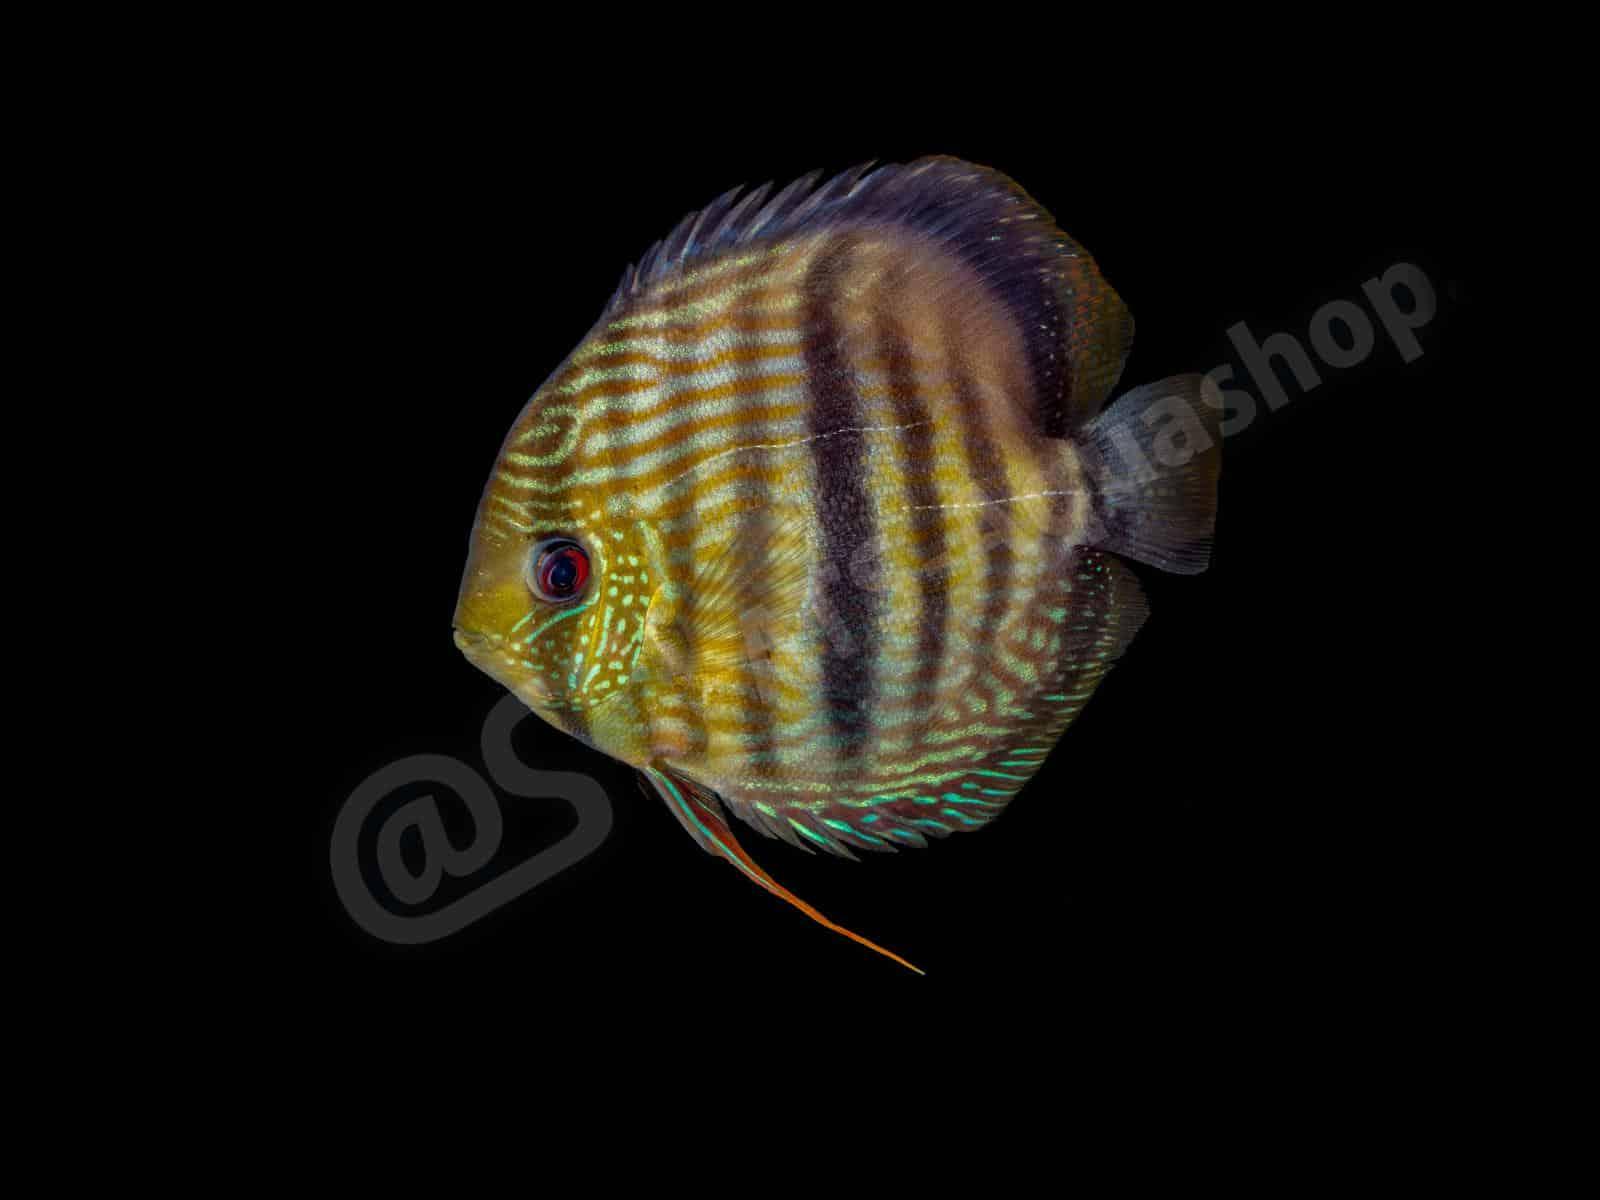 symphysodon diskus  nhamunda  andreas tanke 0095 8